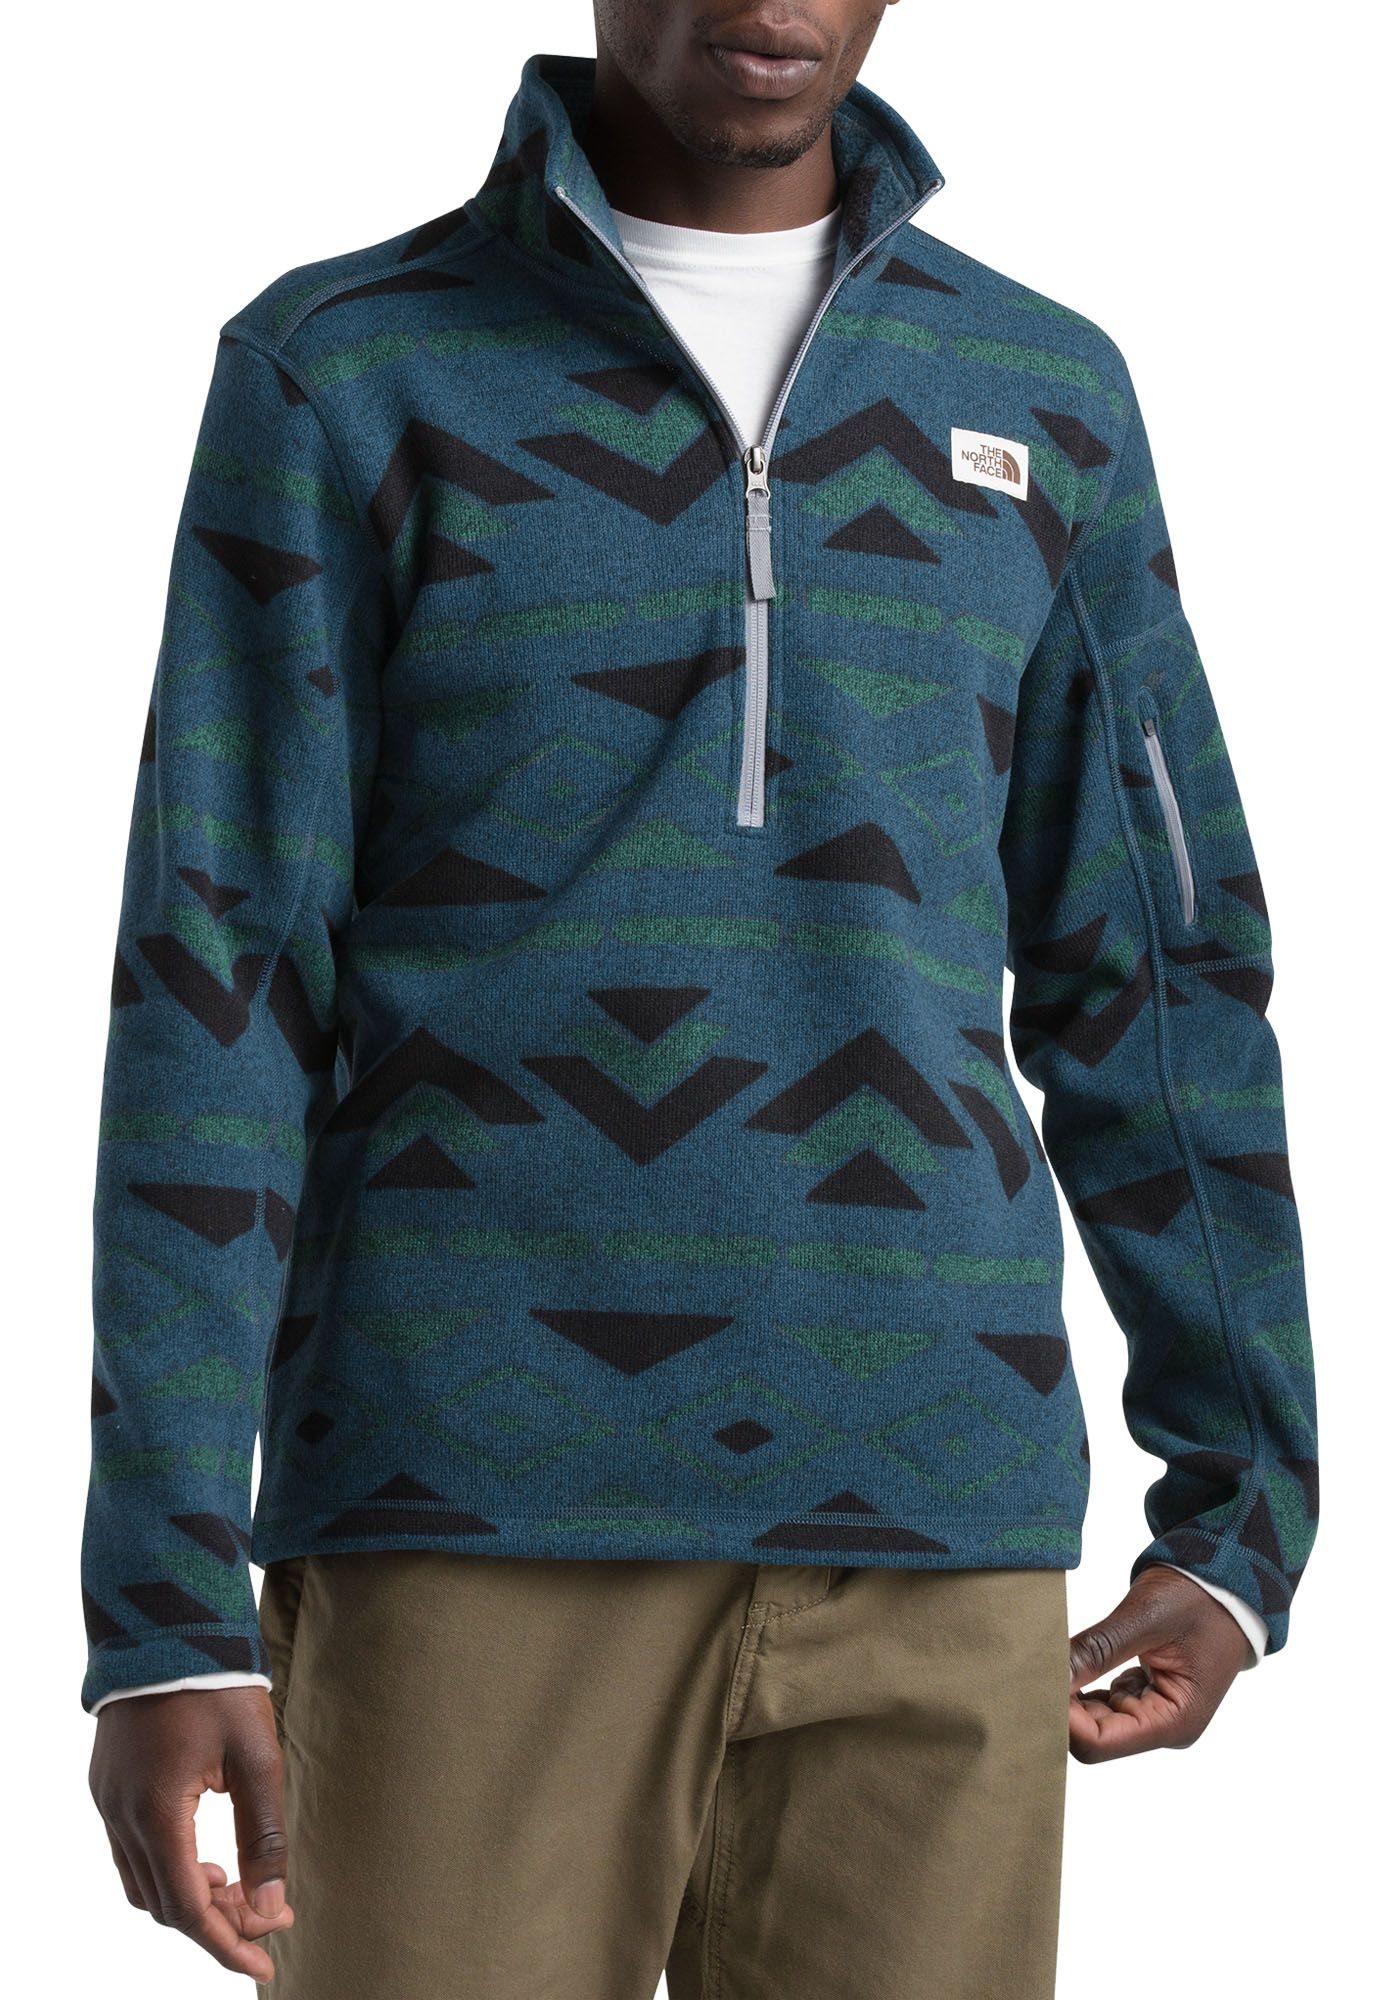 The North Face Men's Gordon Lyons Novelty 1/4 Zip Pullover